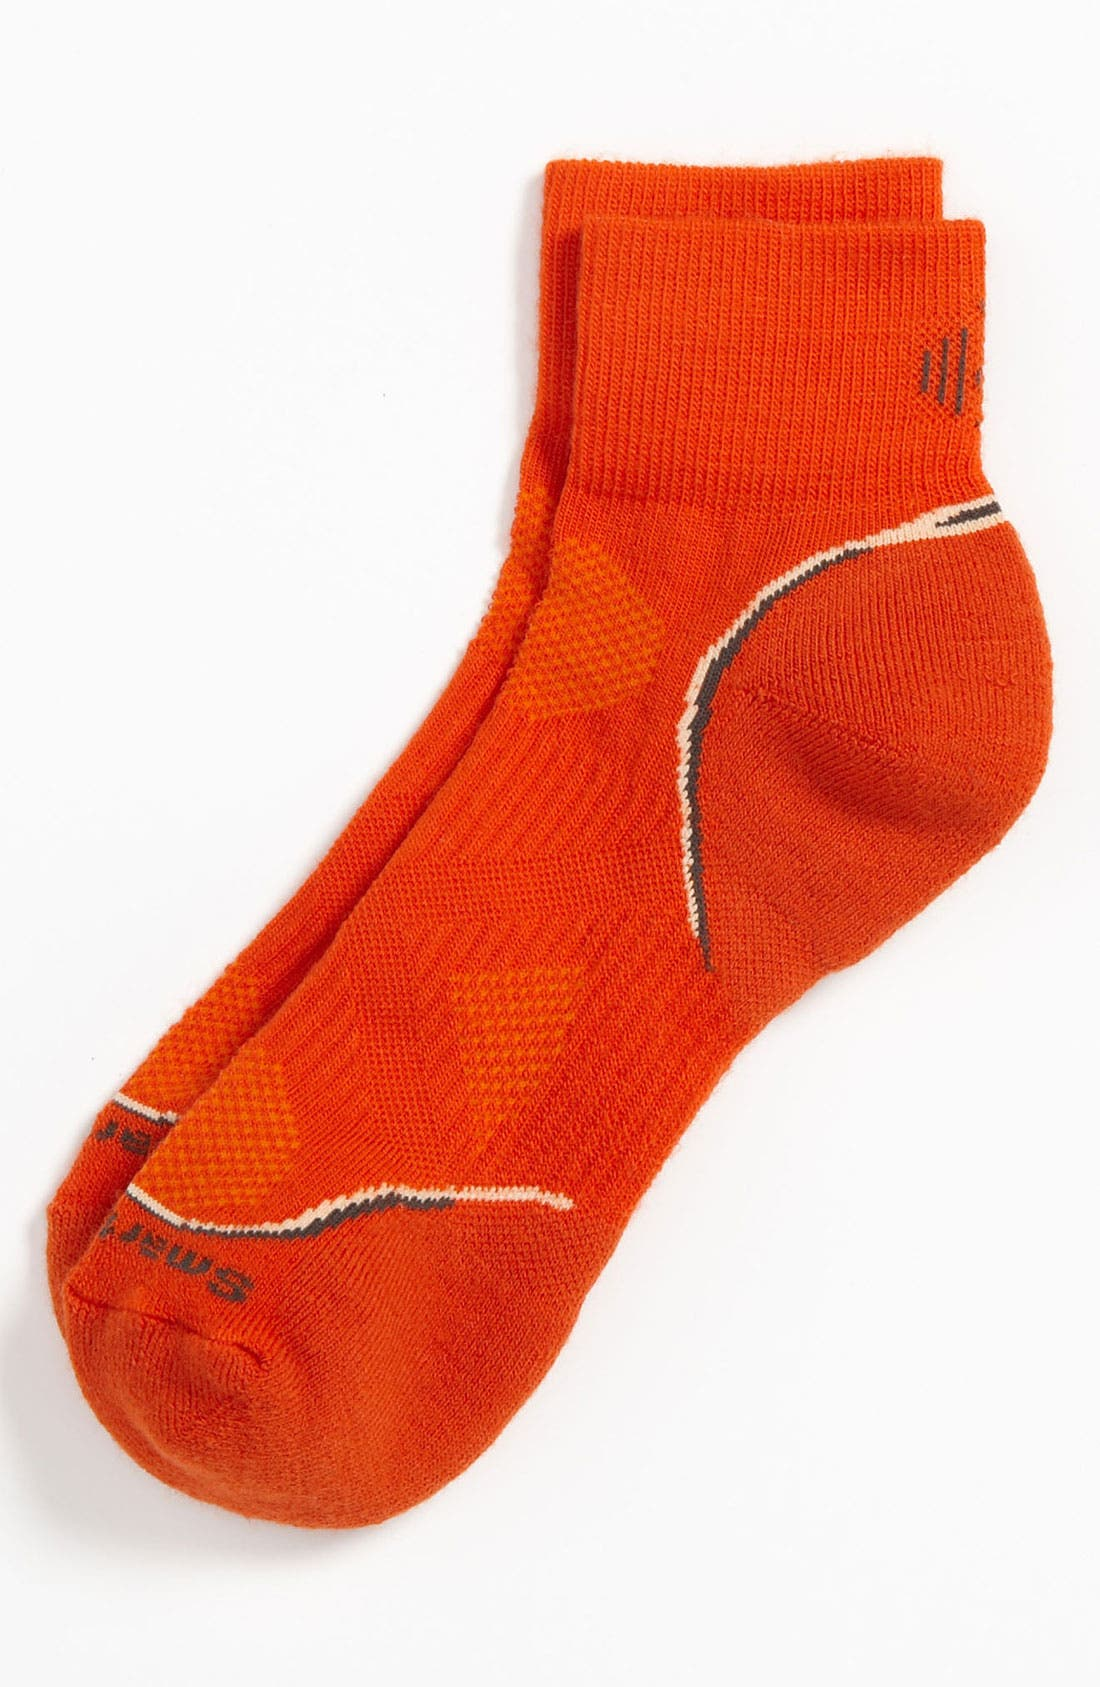 Main Image - Smartwool 'PhD' Running Light Mini Socks